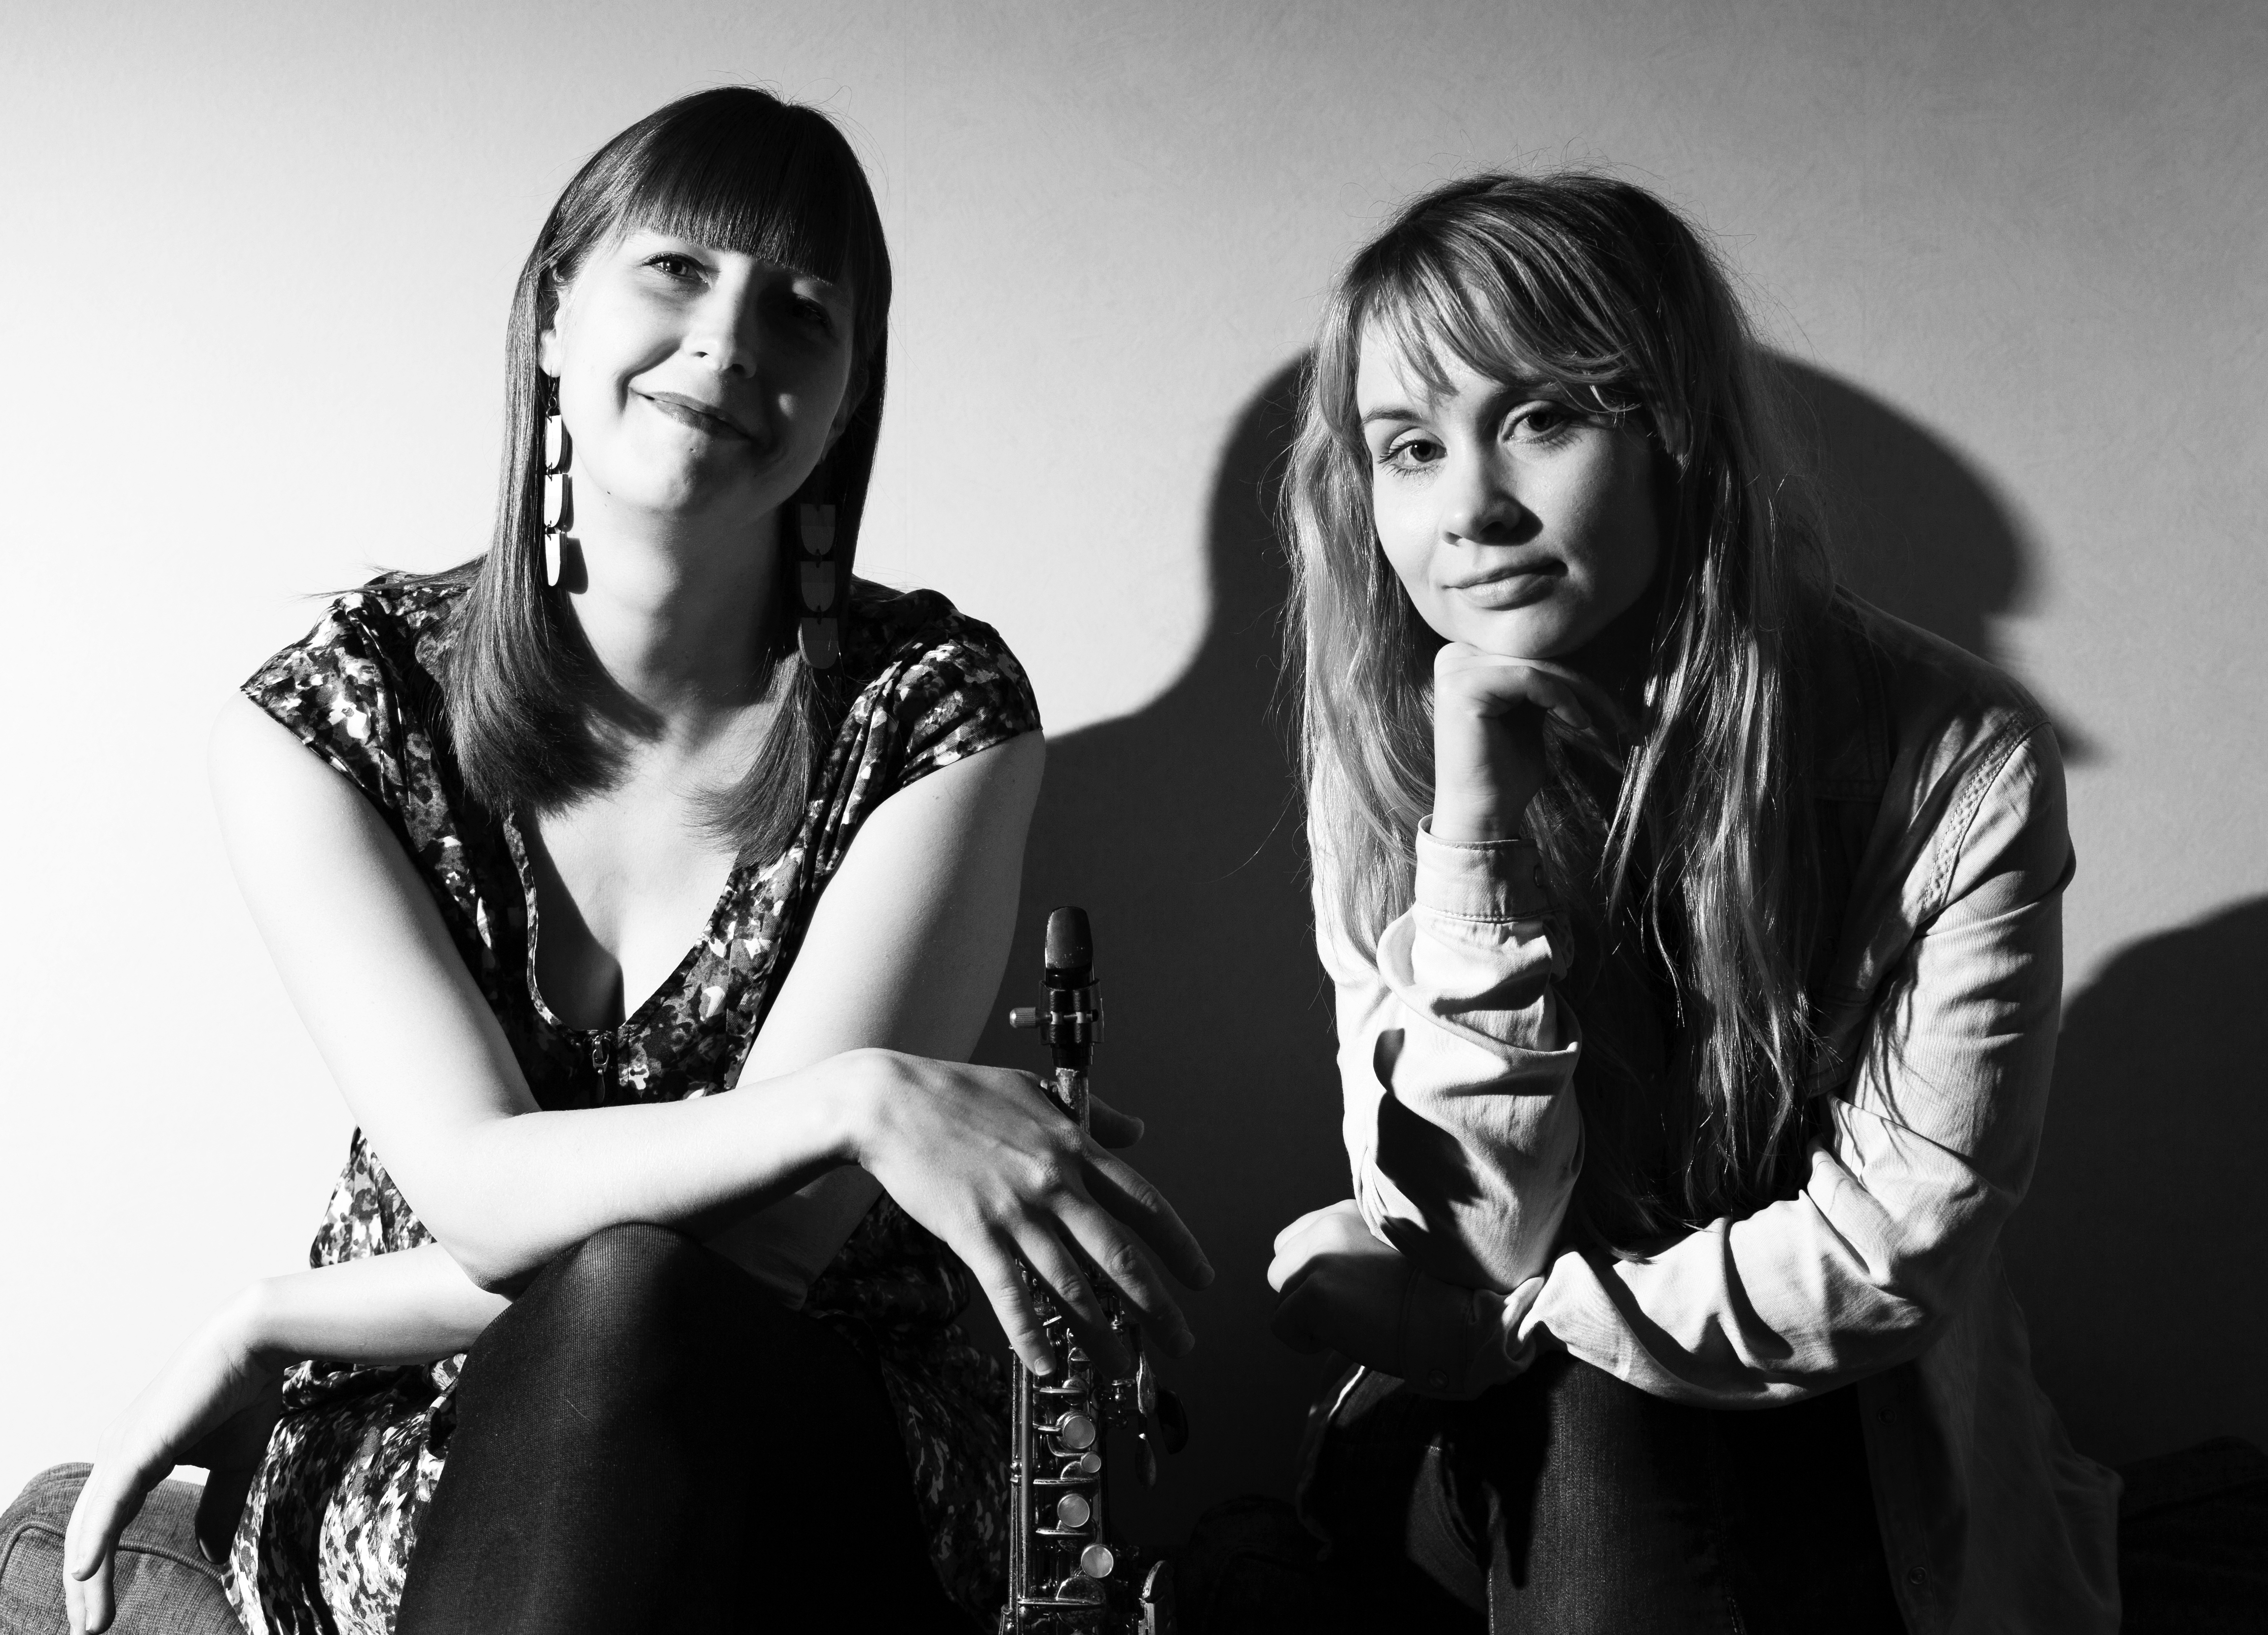 Tiina & Pajazzolla duo